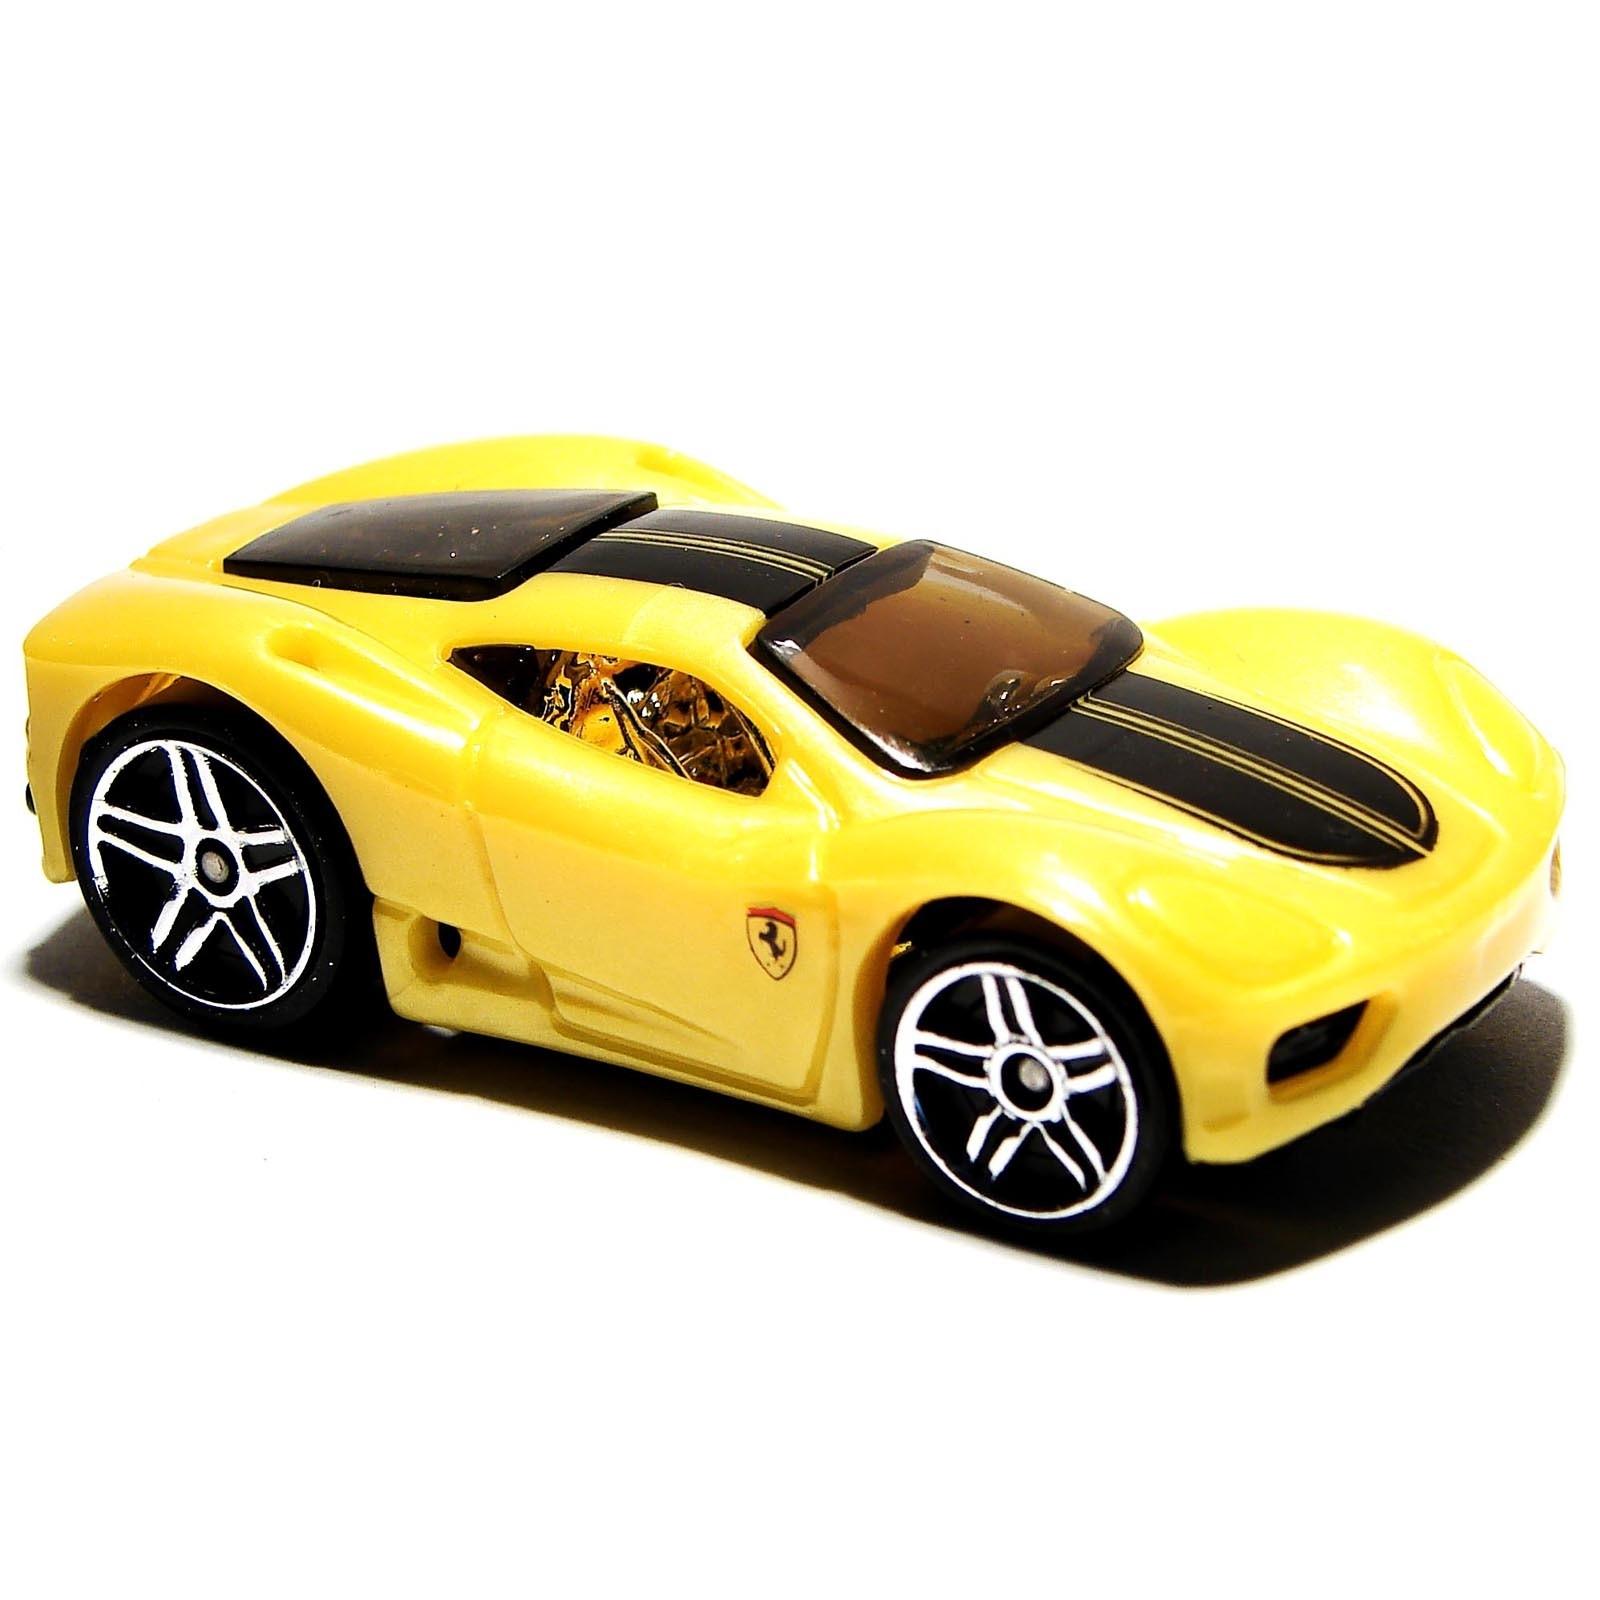 Hot Wheels Ferrari 360 Modena M6934 A519 Escala Miniaturas By Mao Na Roda 4x4